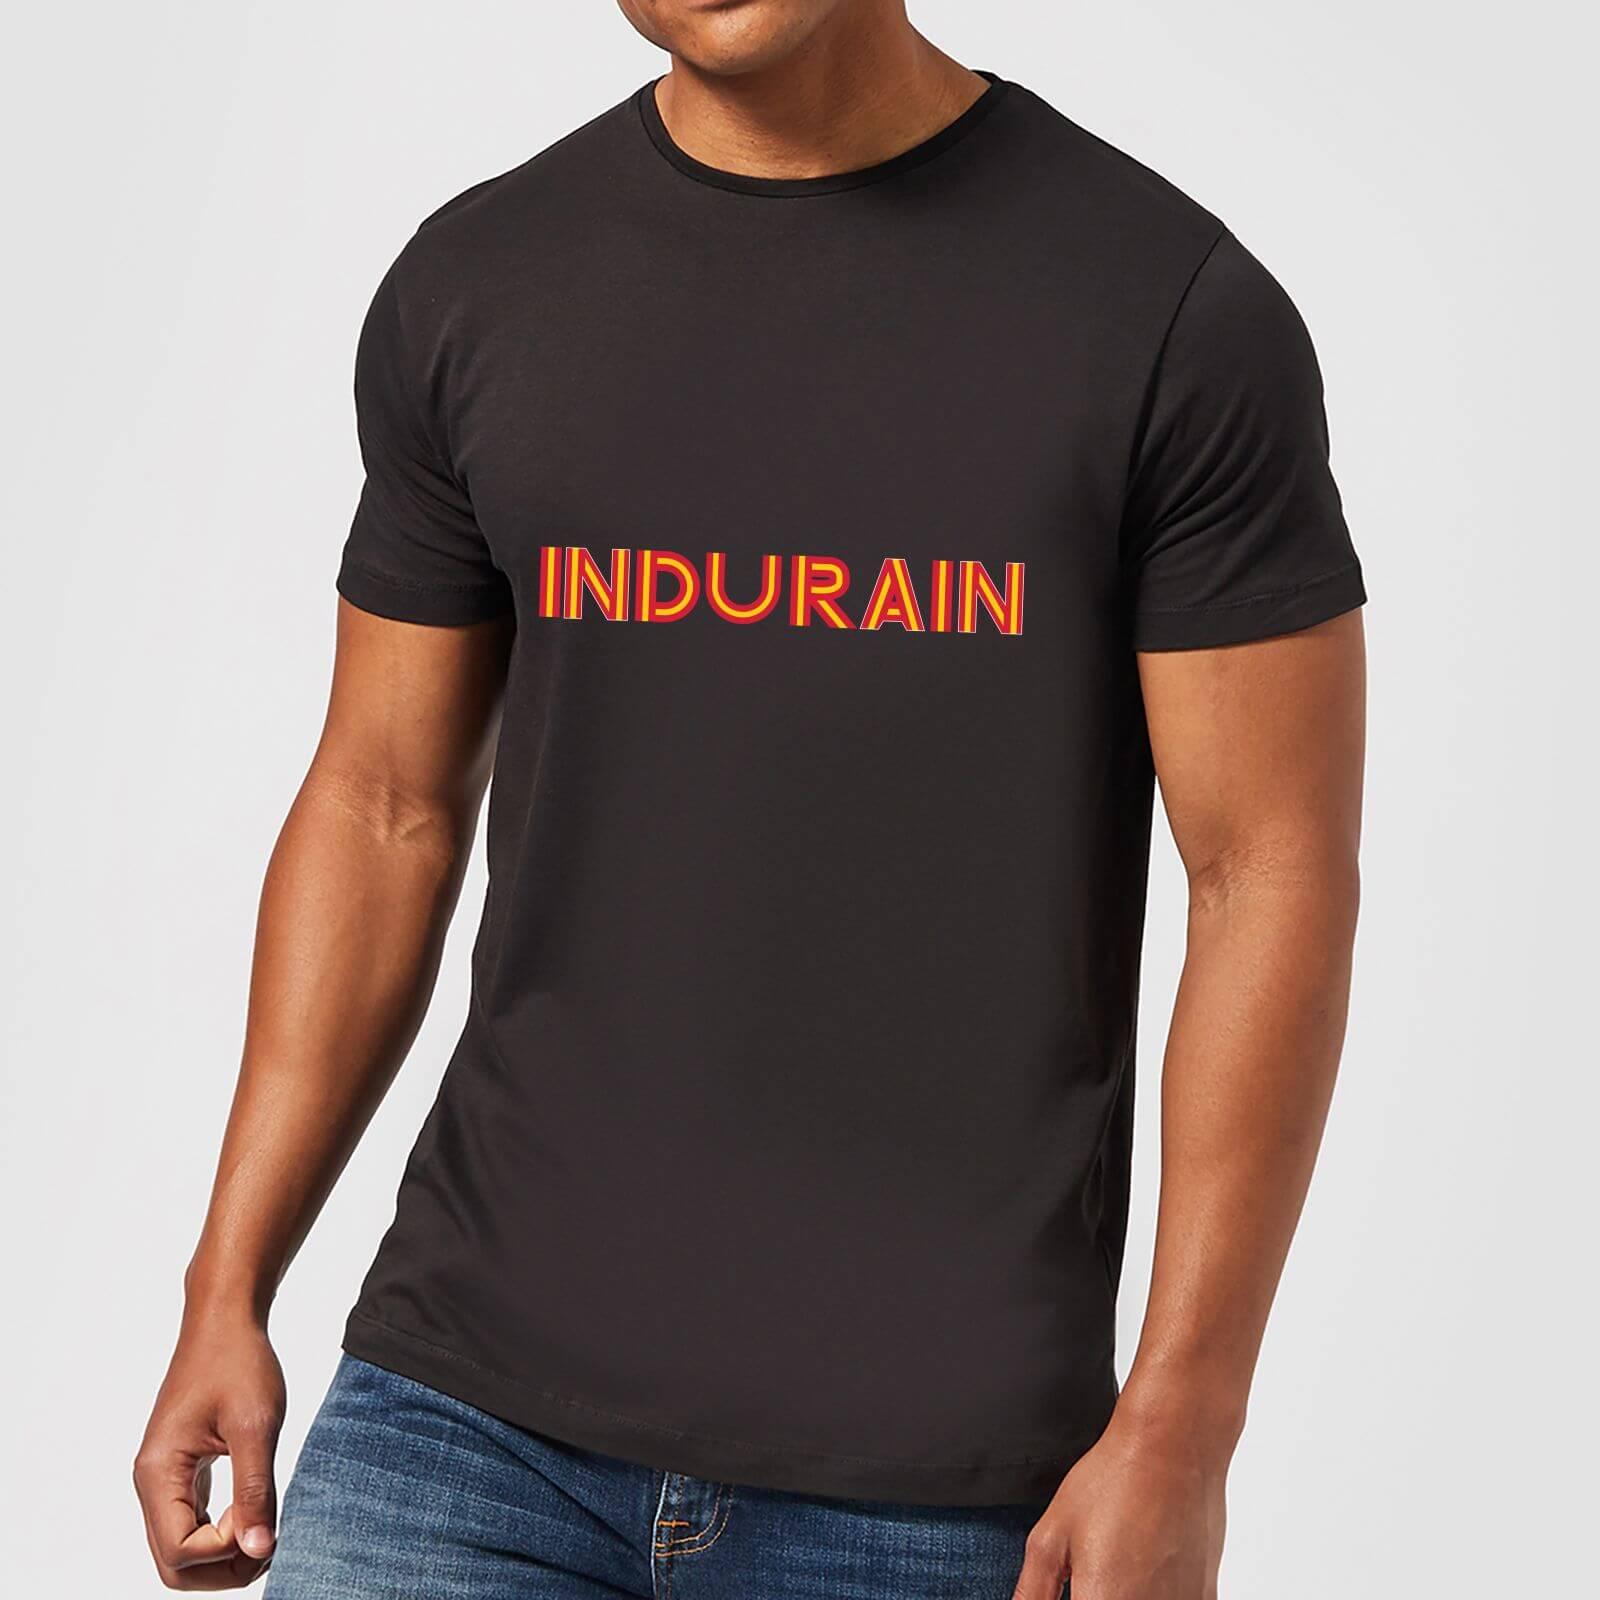 Summit Finish Indurain - Rider Name Men's T-Shirt - Black - 4XL - Schwarz